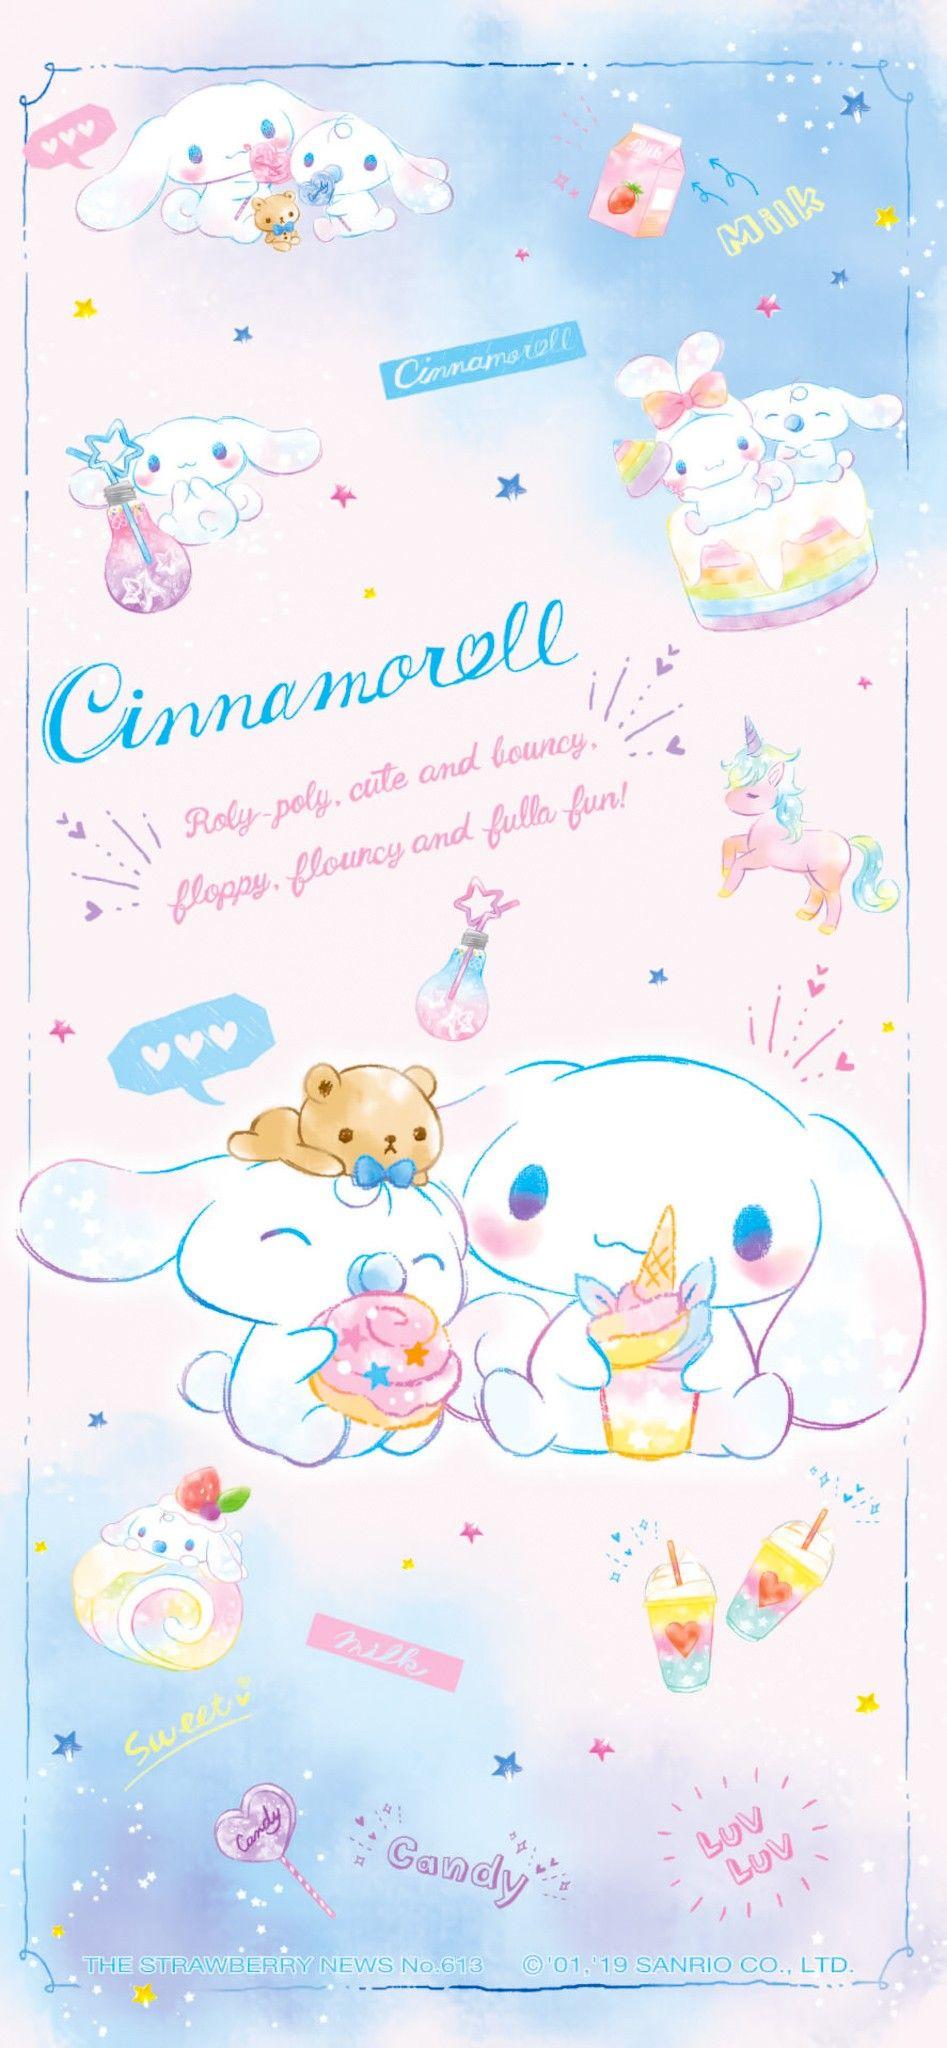 Cinnamoroll Bg おしゃれまとめの人気アイデア Pinterest Angkhanng Jongkol シナモロール 壁紙 マイメロ 壁紙 サンリオ 壁紙